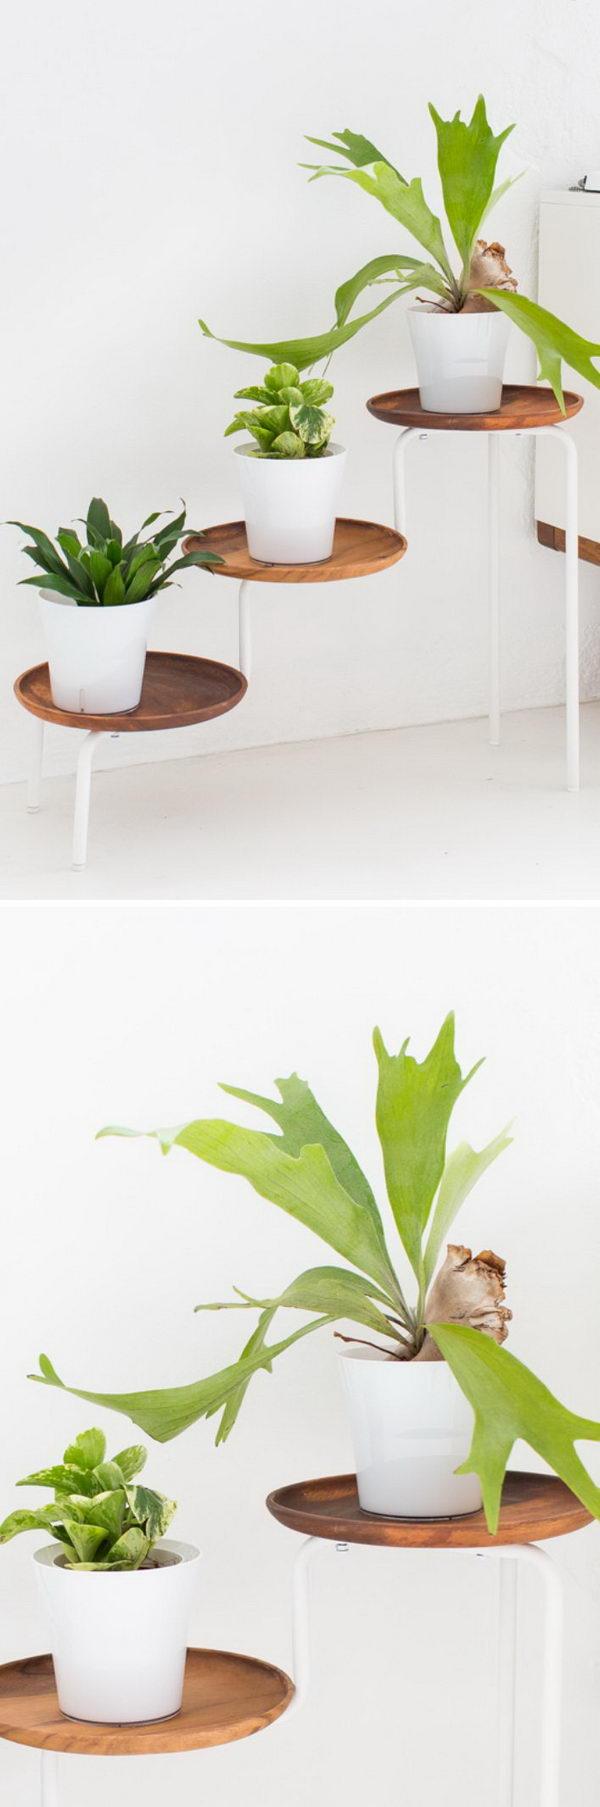 DIY Acacia Wood Plant Stand.